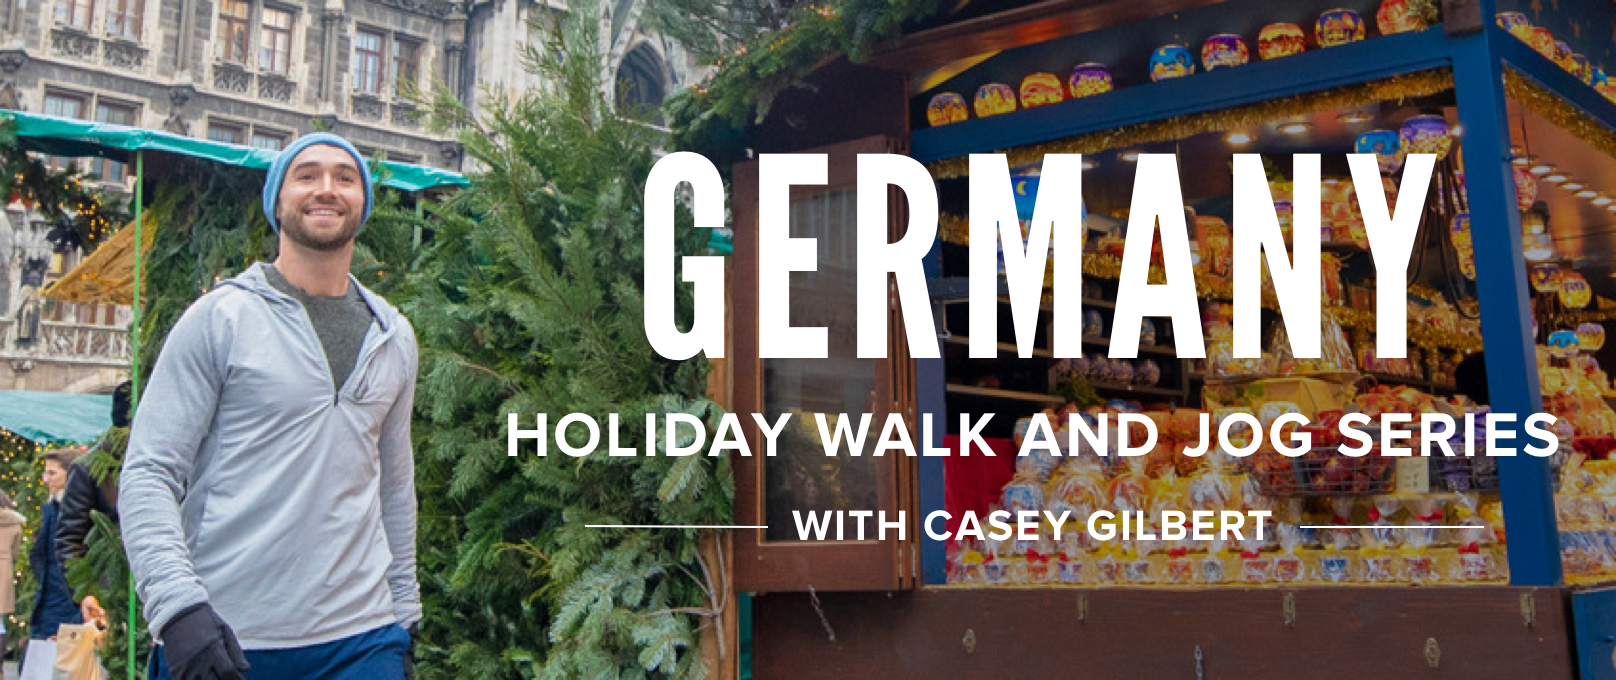 iFit Germany Holiday Walk And Jog Series walking and jogging workouts